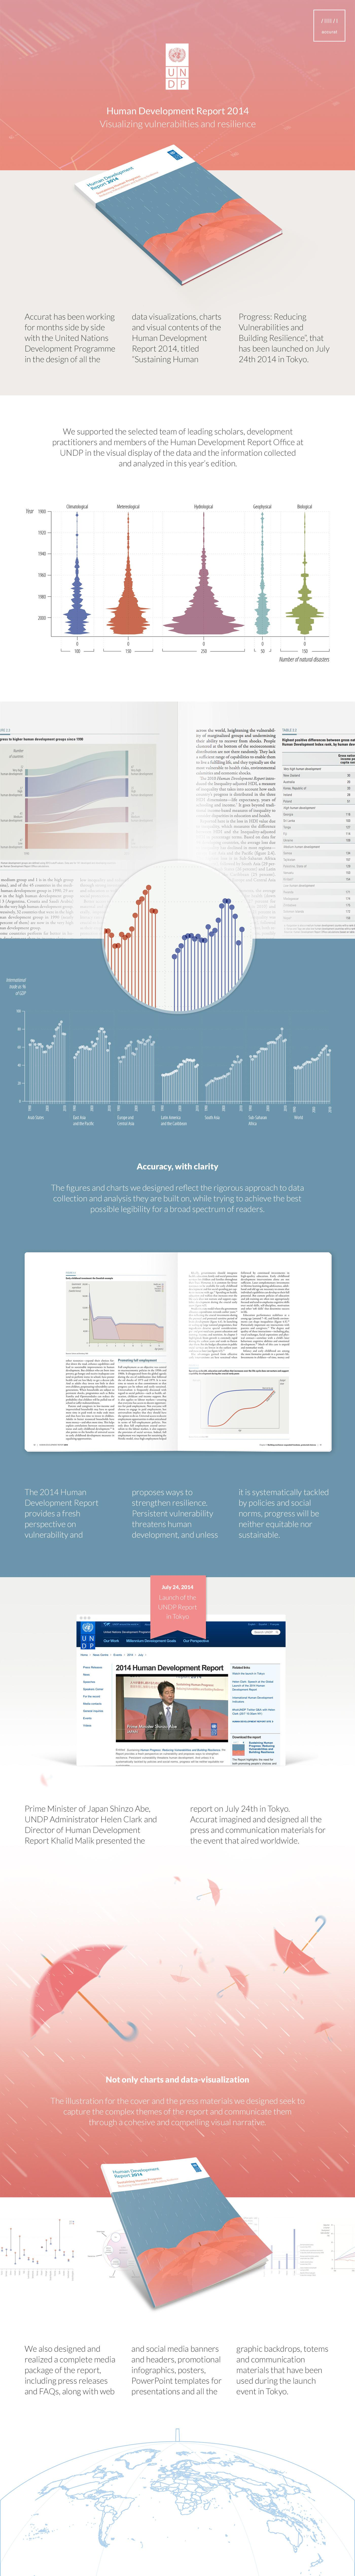 un undp United Nations Human Development Report cover design Umbrella Charts data visualization information design report